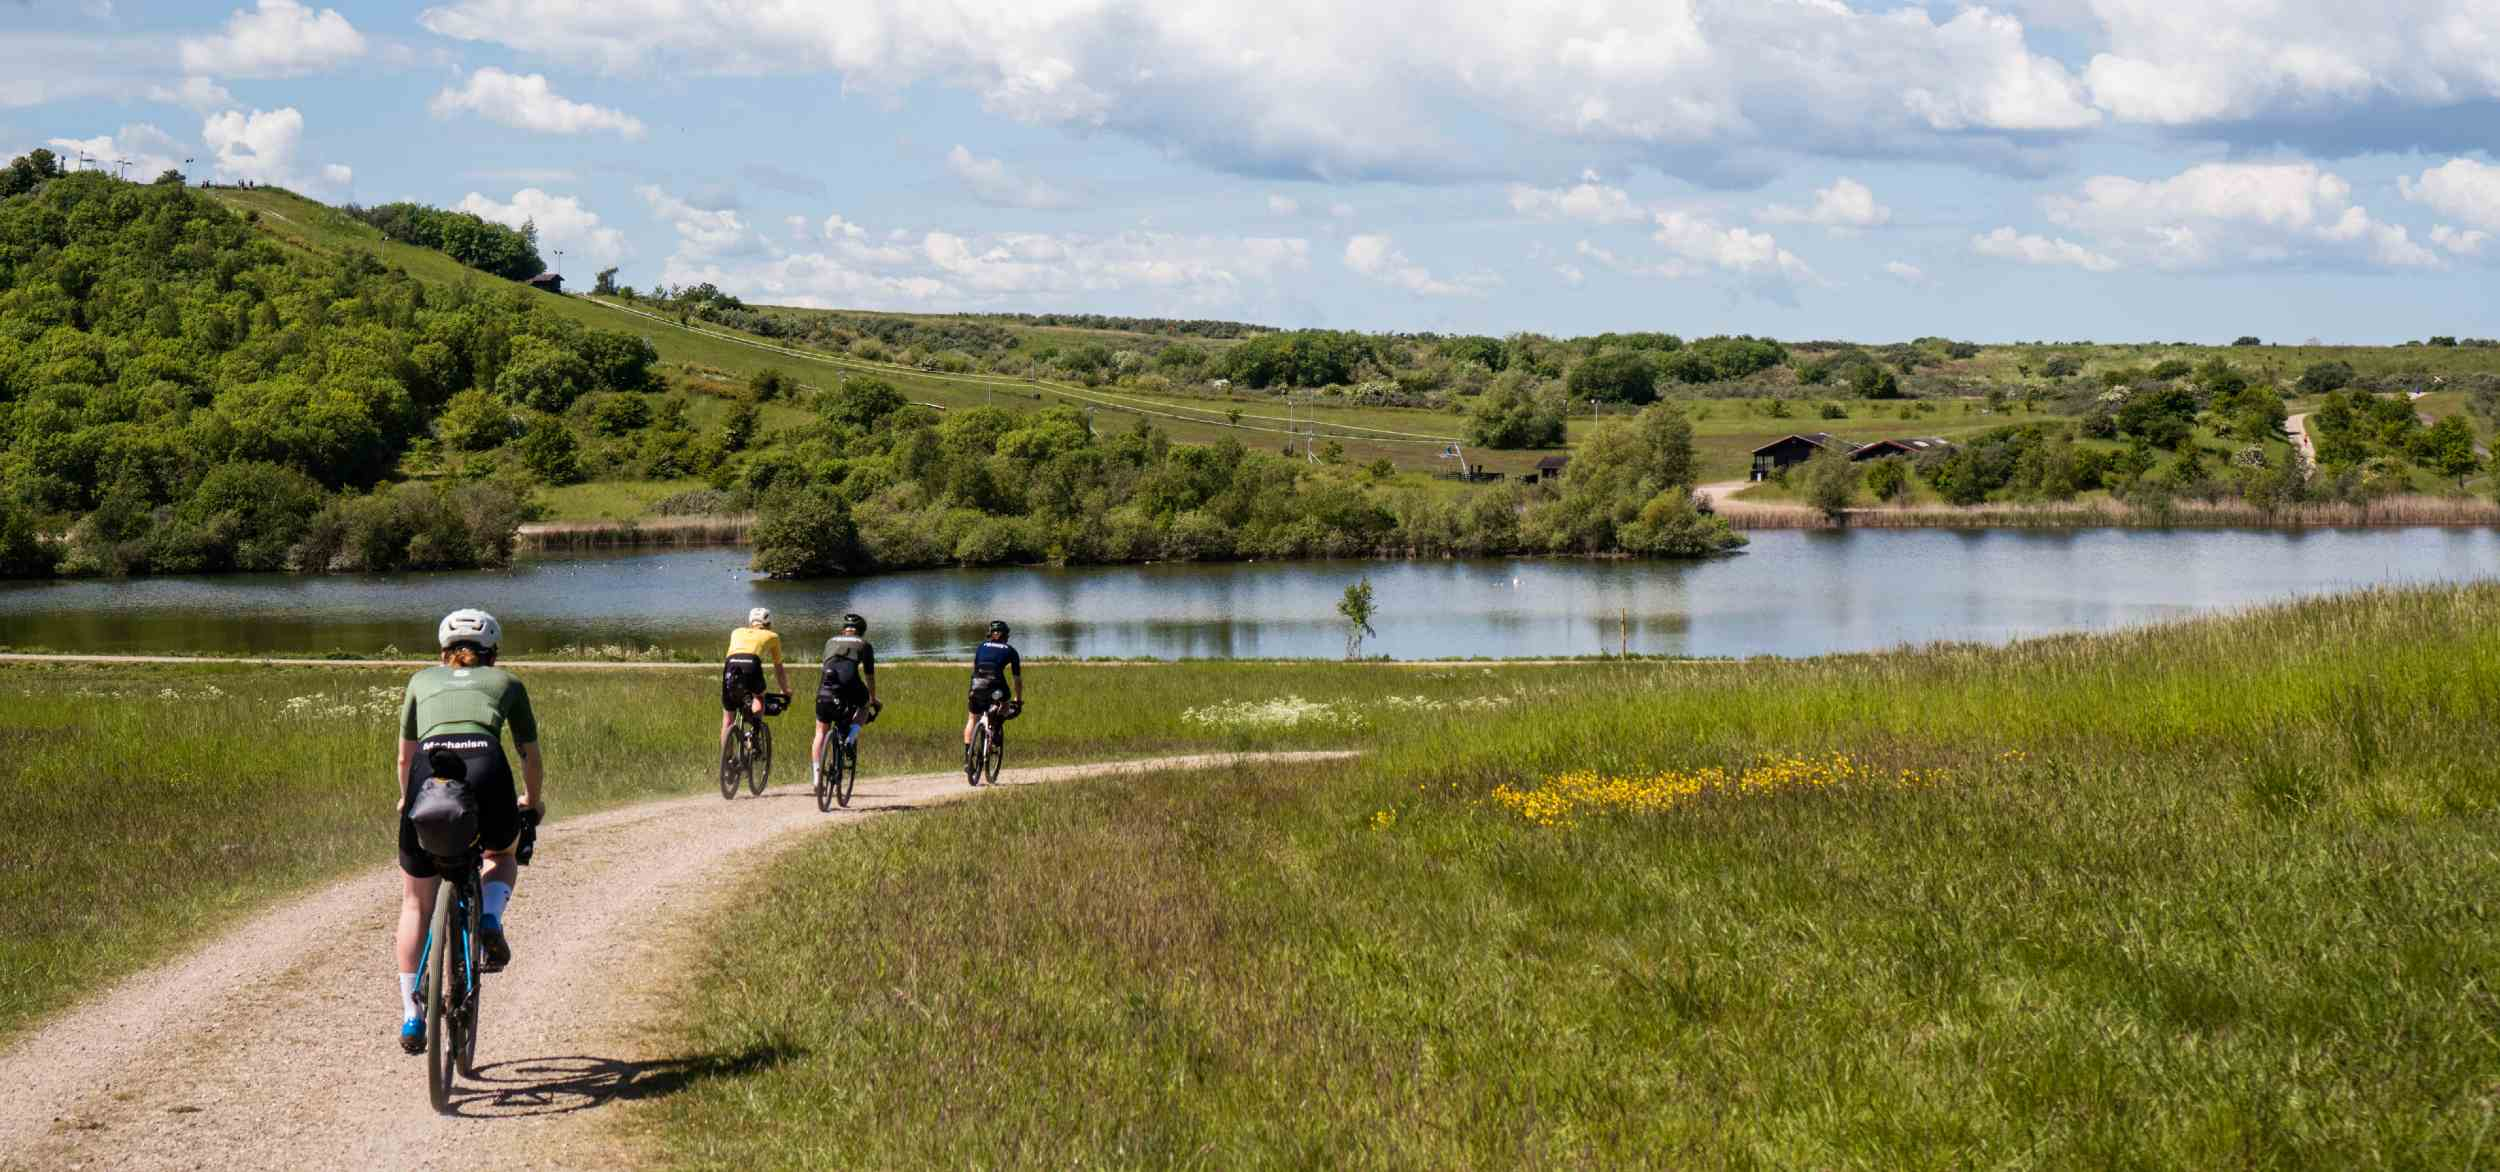 A line of cyclists ride alongside a lake on a gravel trail